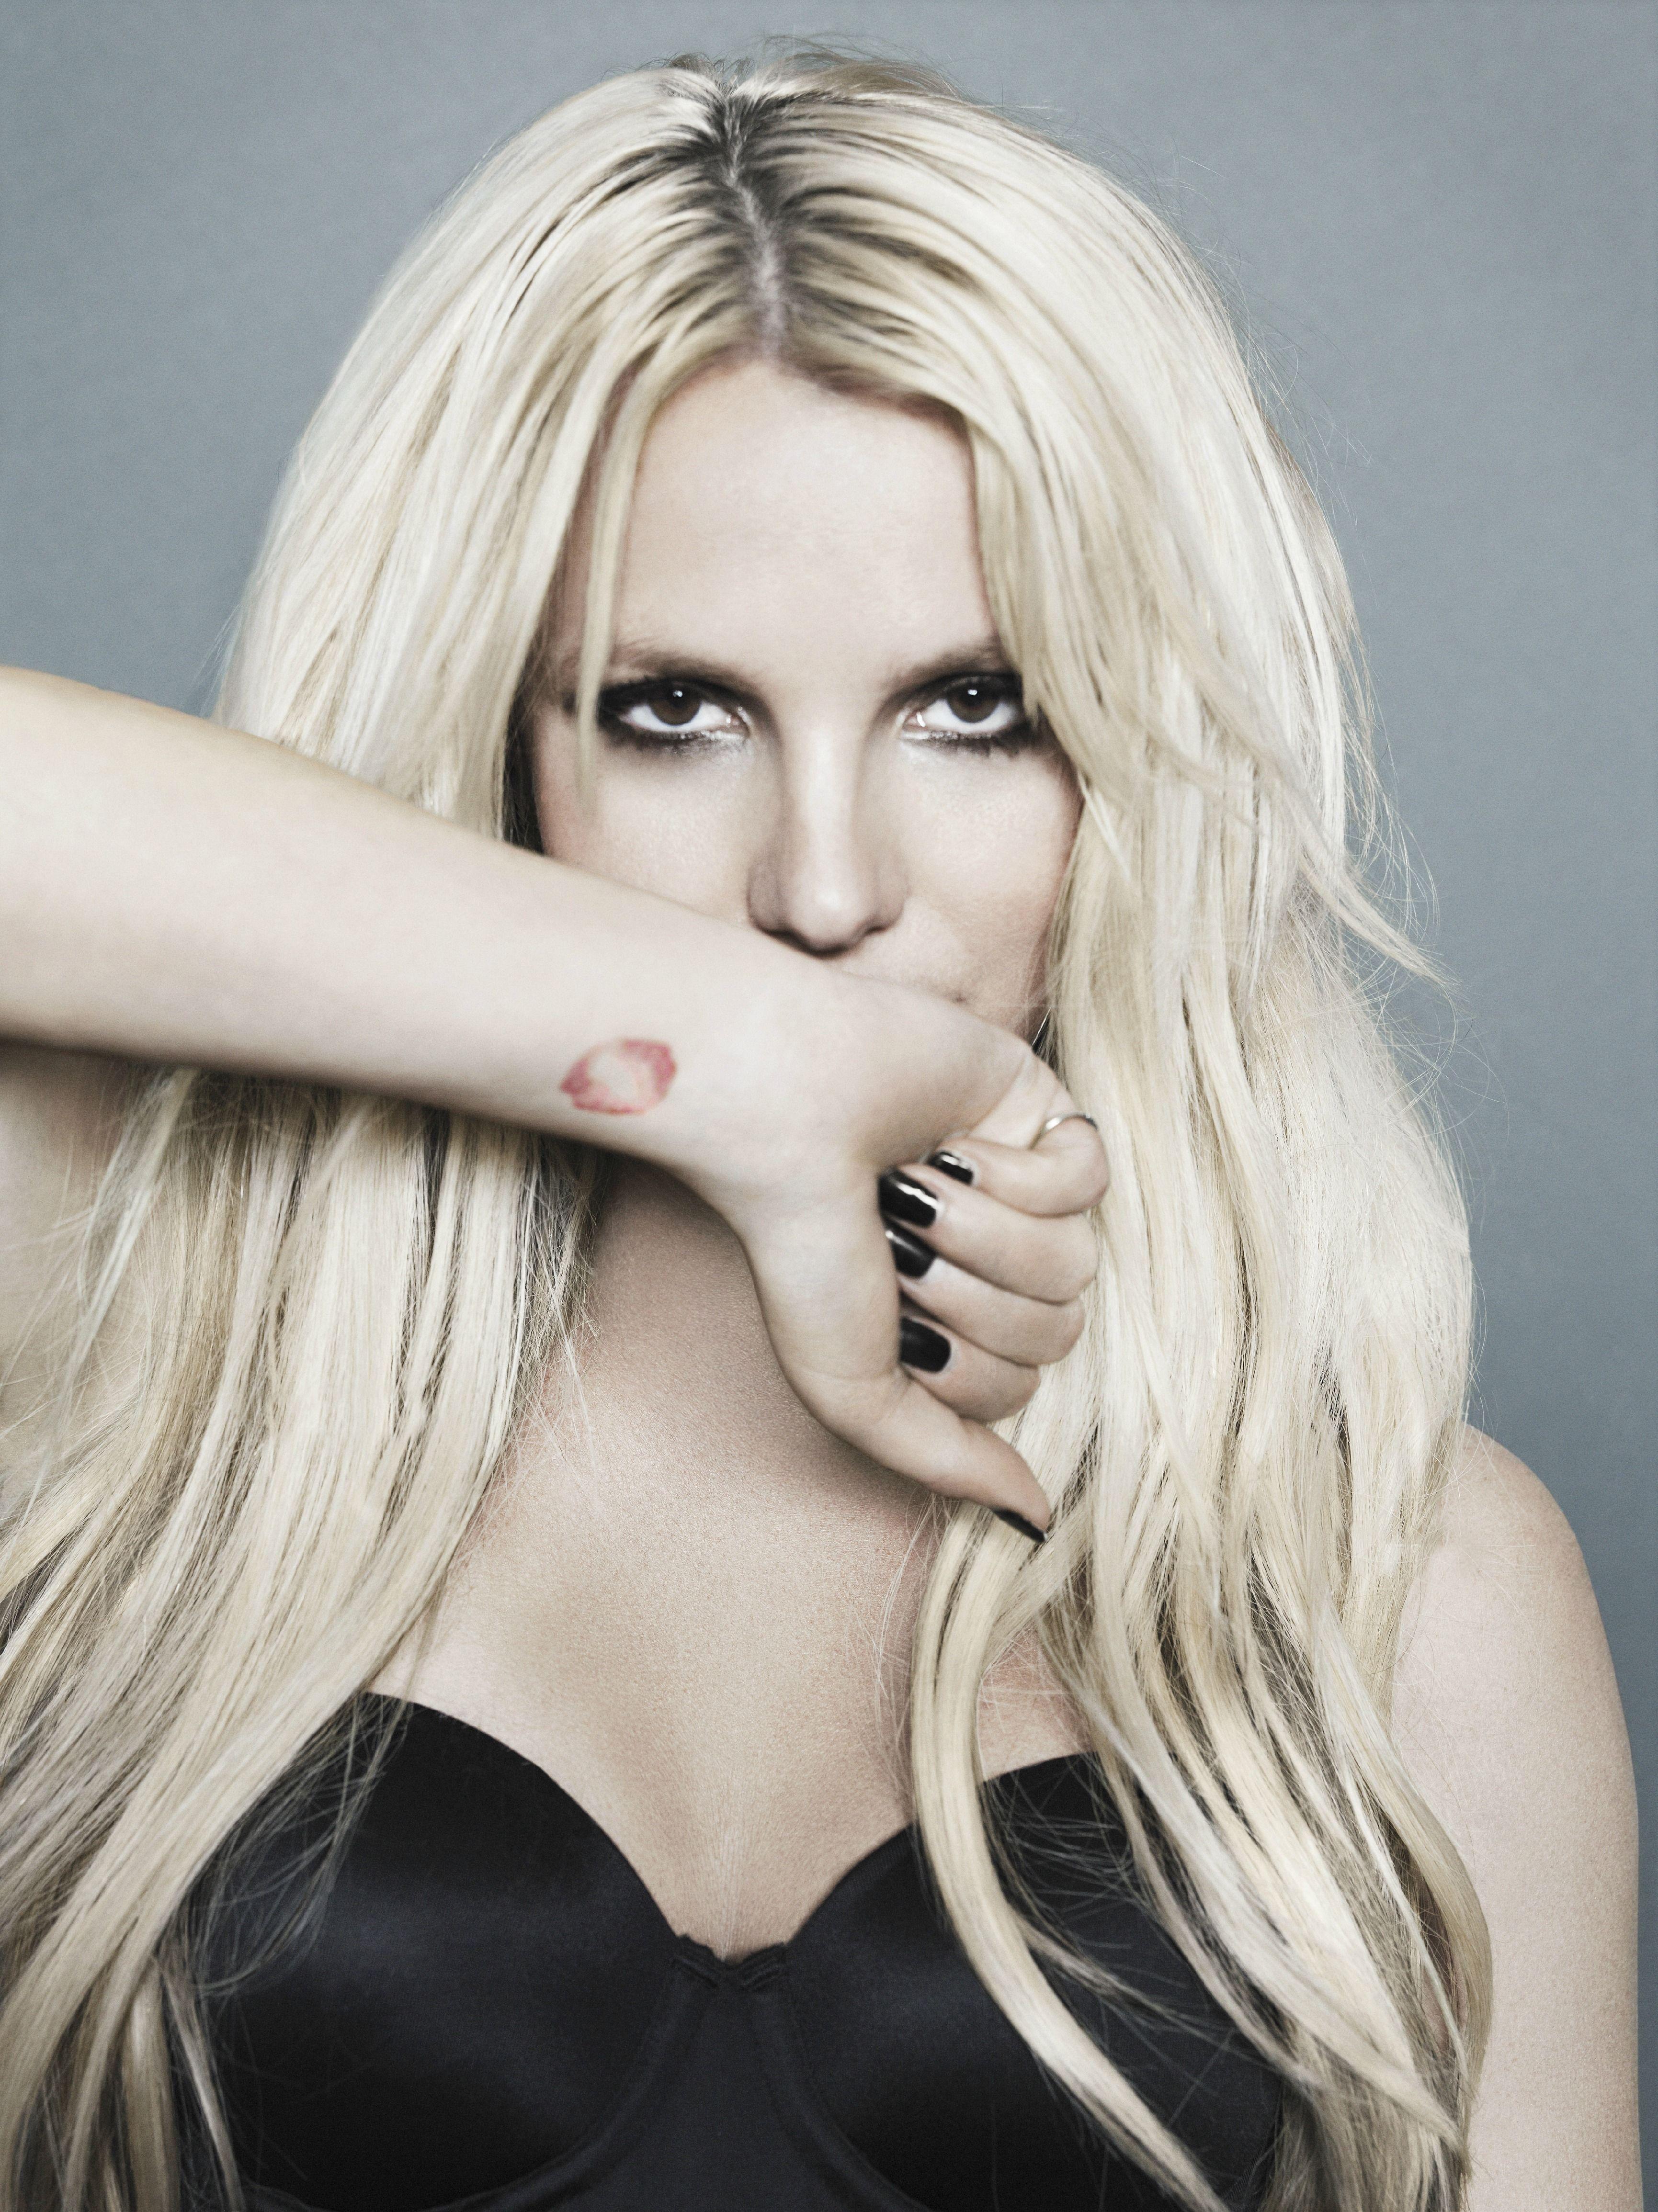 Britney toxic bodysuit lopez spear jennifer